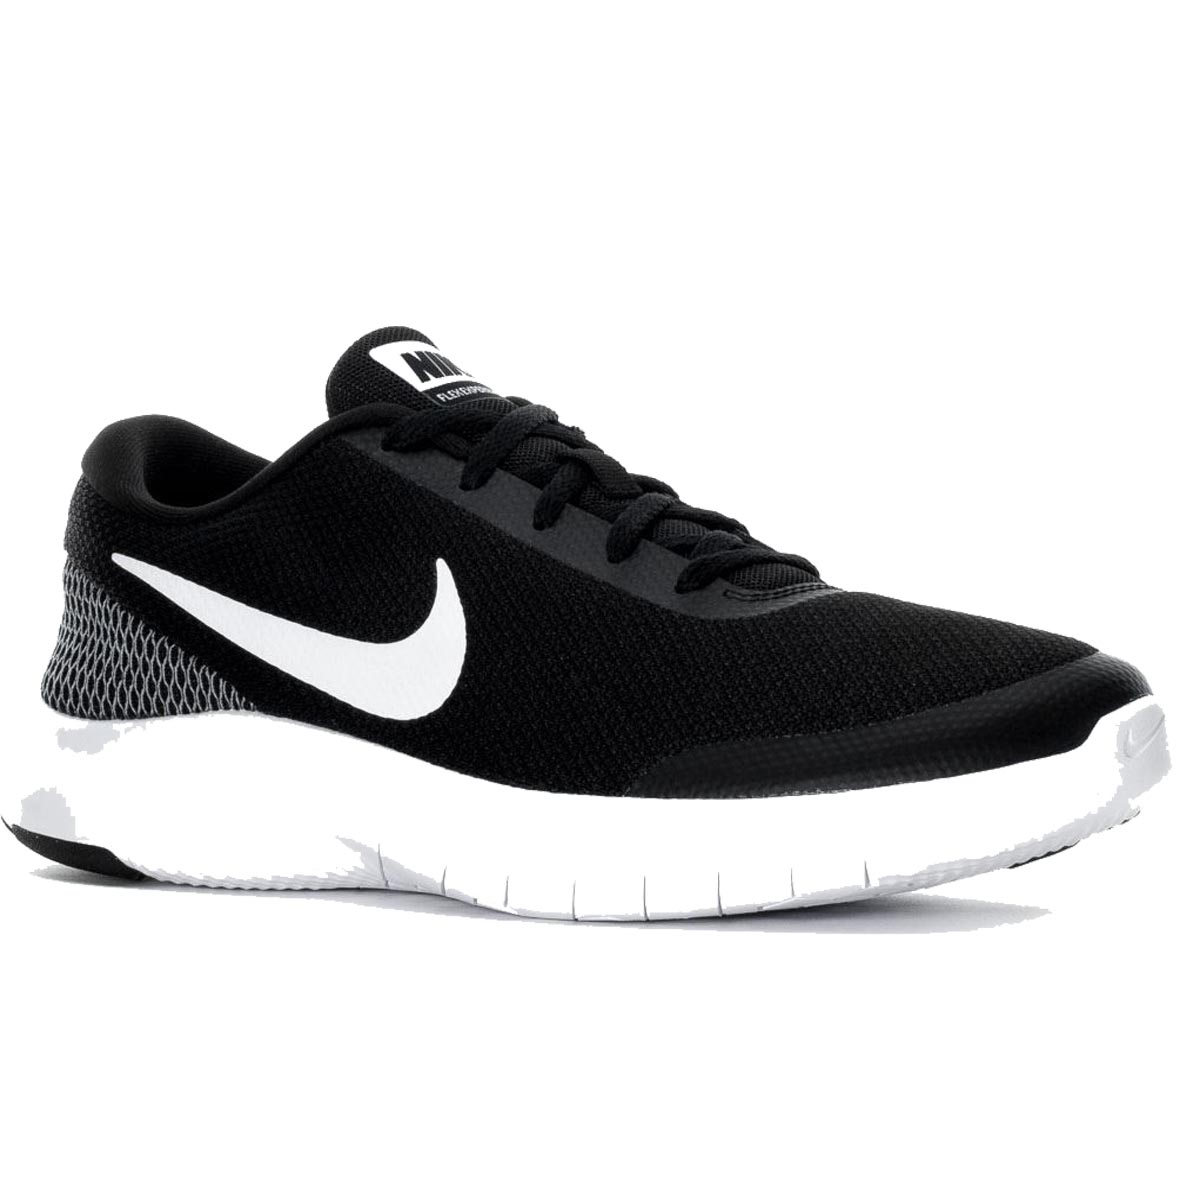 Buy Nike Flex Experience RN7 Running